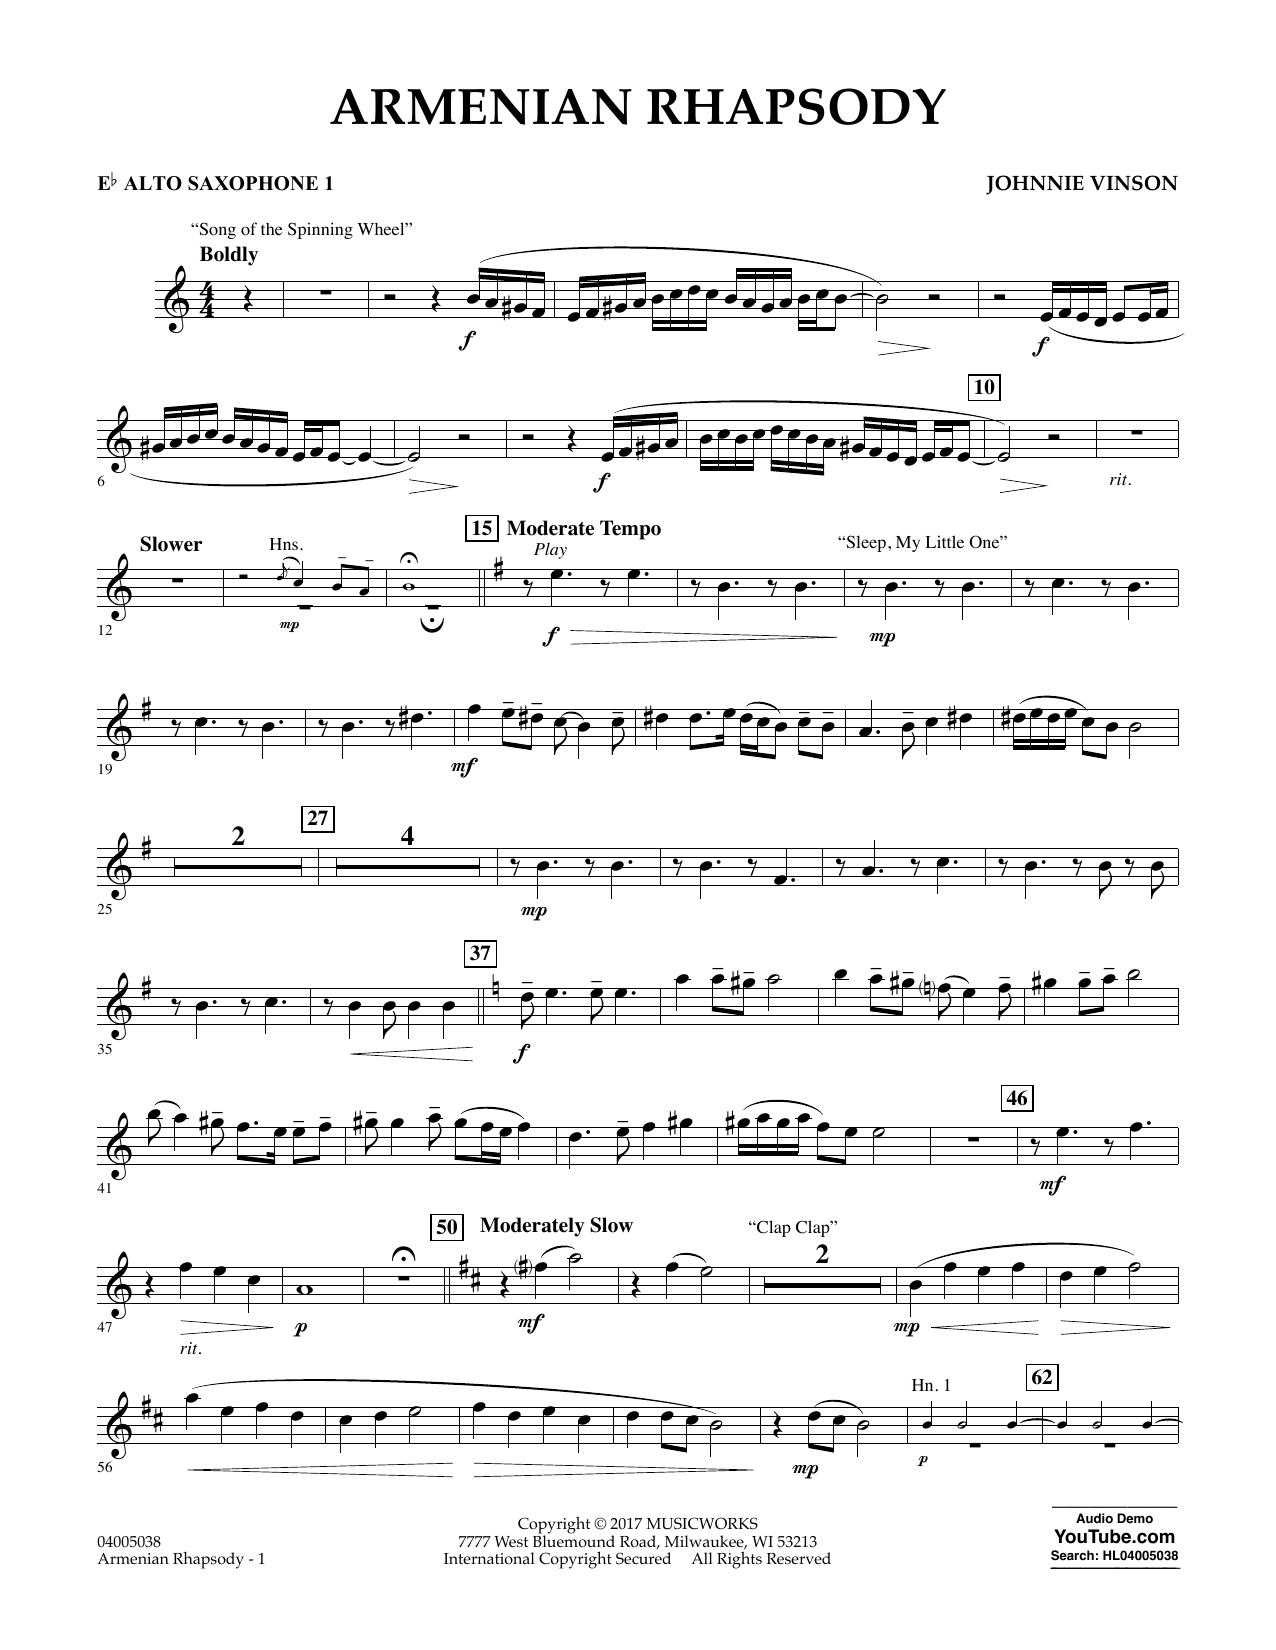 Armenian Rhapsody - Eb Alto Saxophone 1 atStanton's Sheet Music